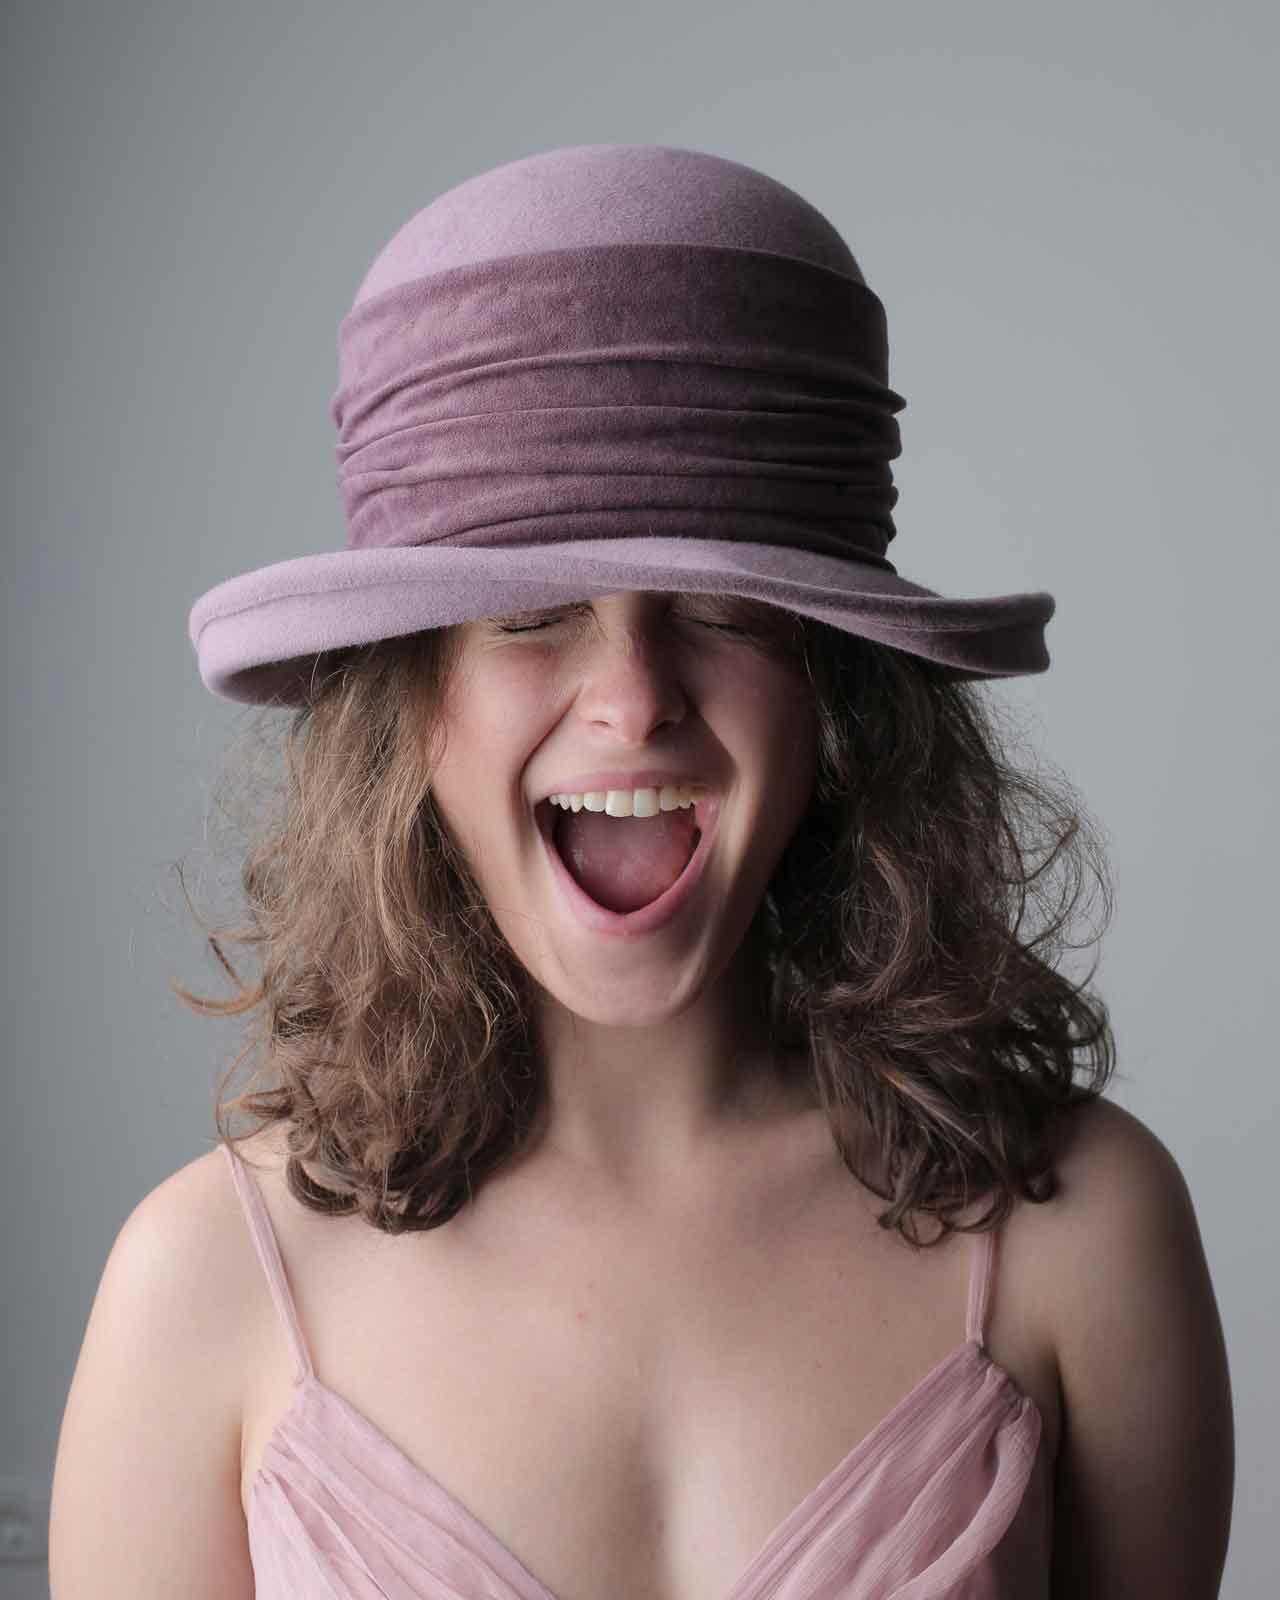 fashion-woman-girl-cute-3979104